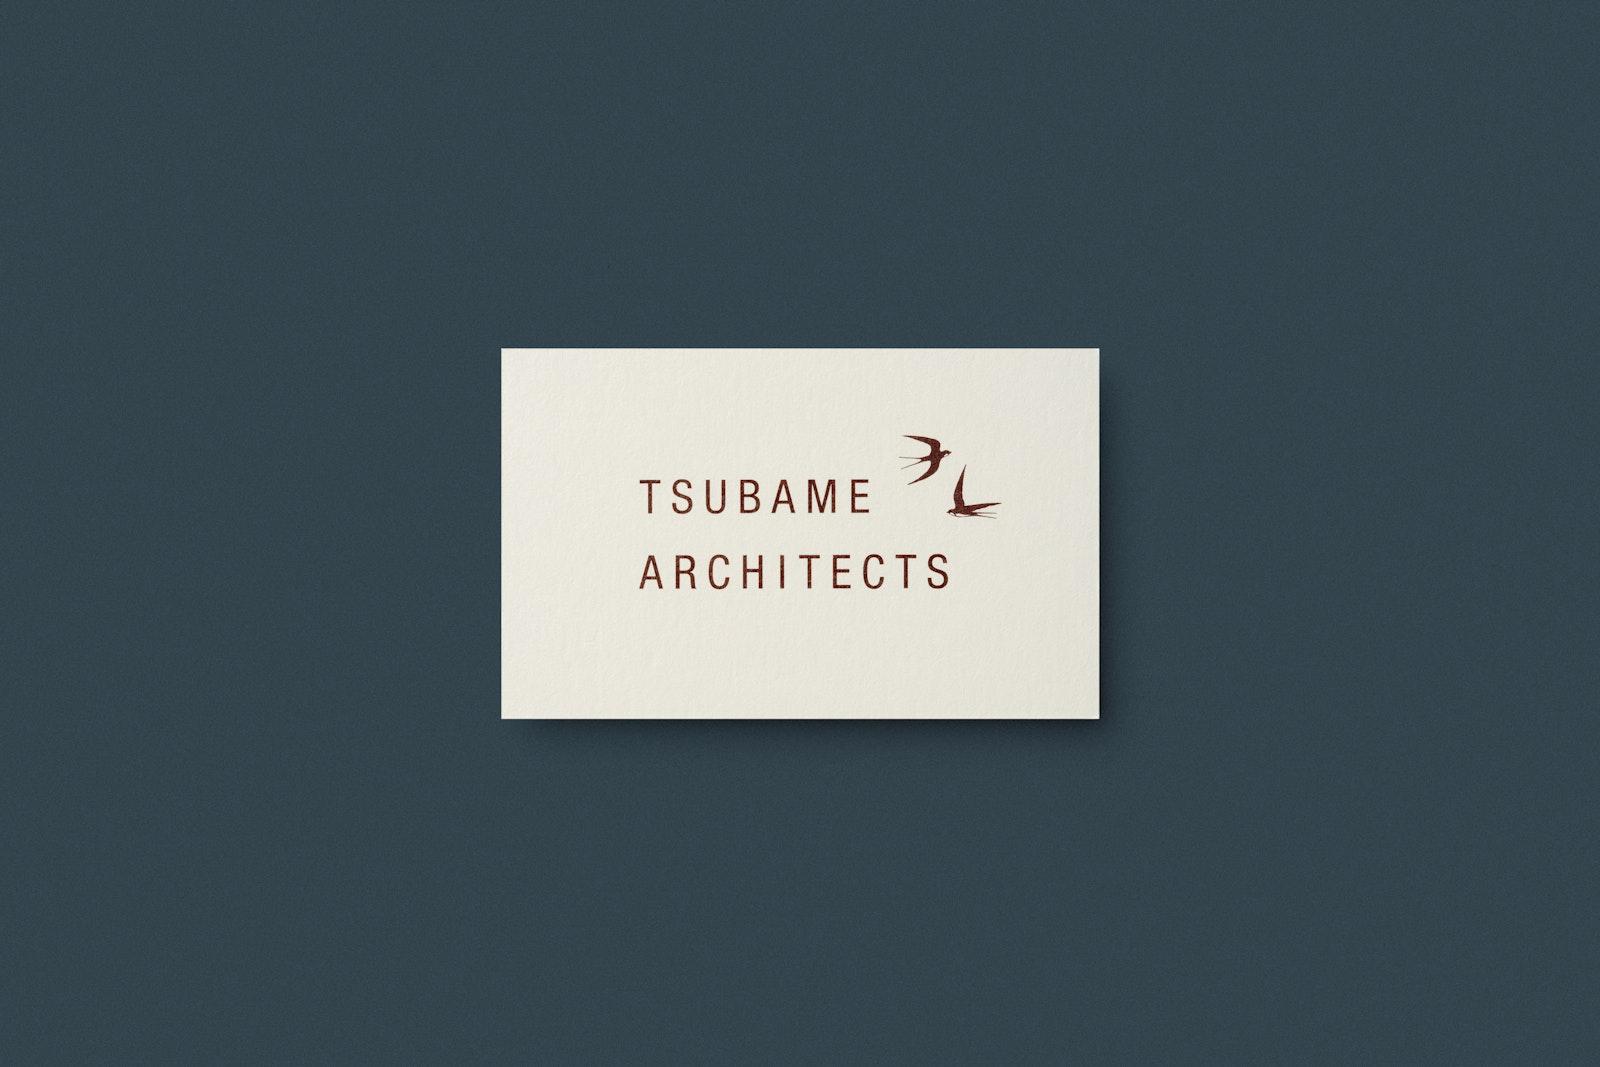 Tsubame Architects